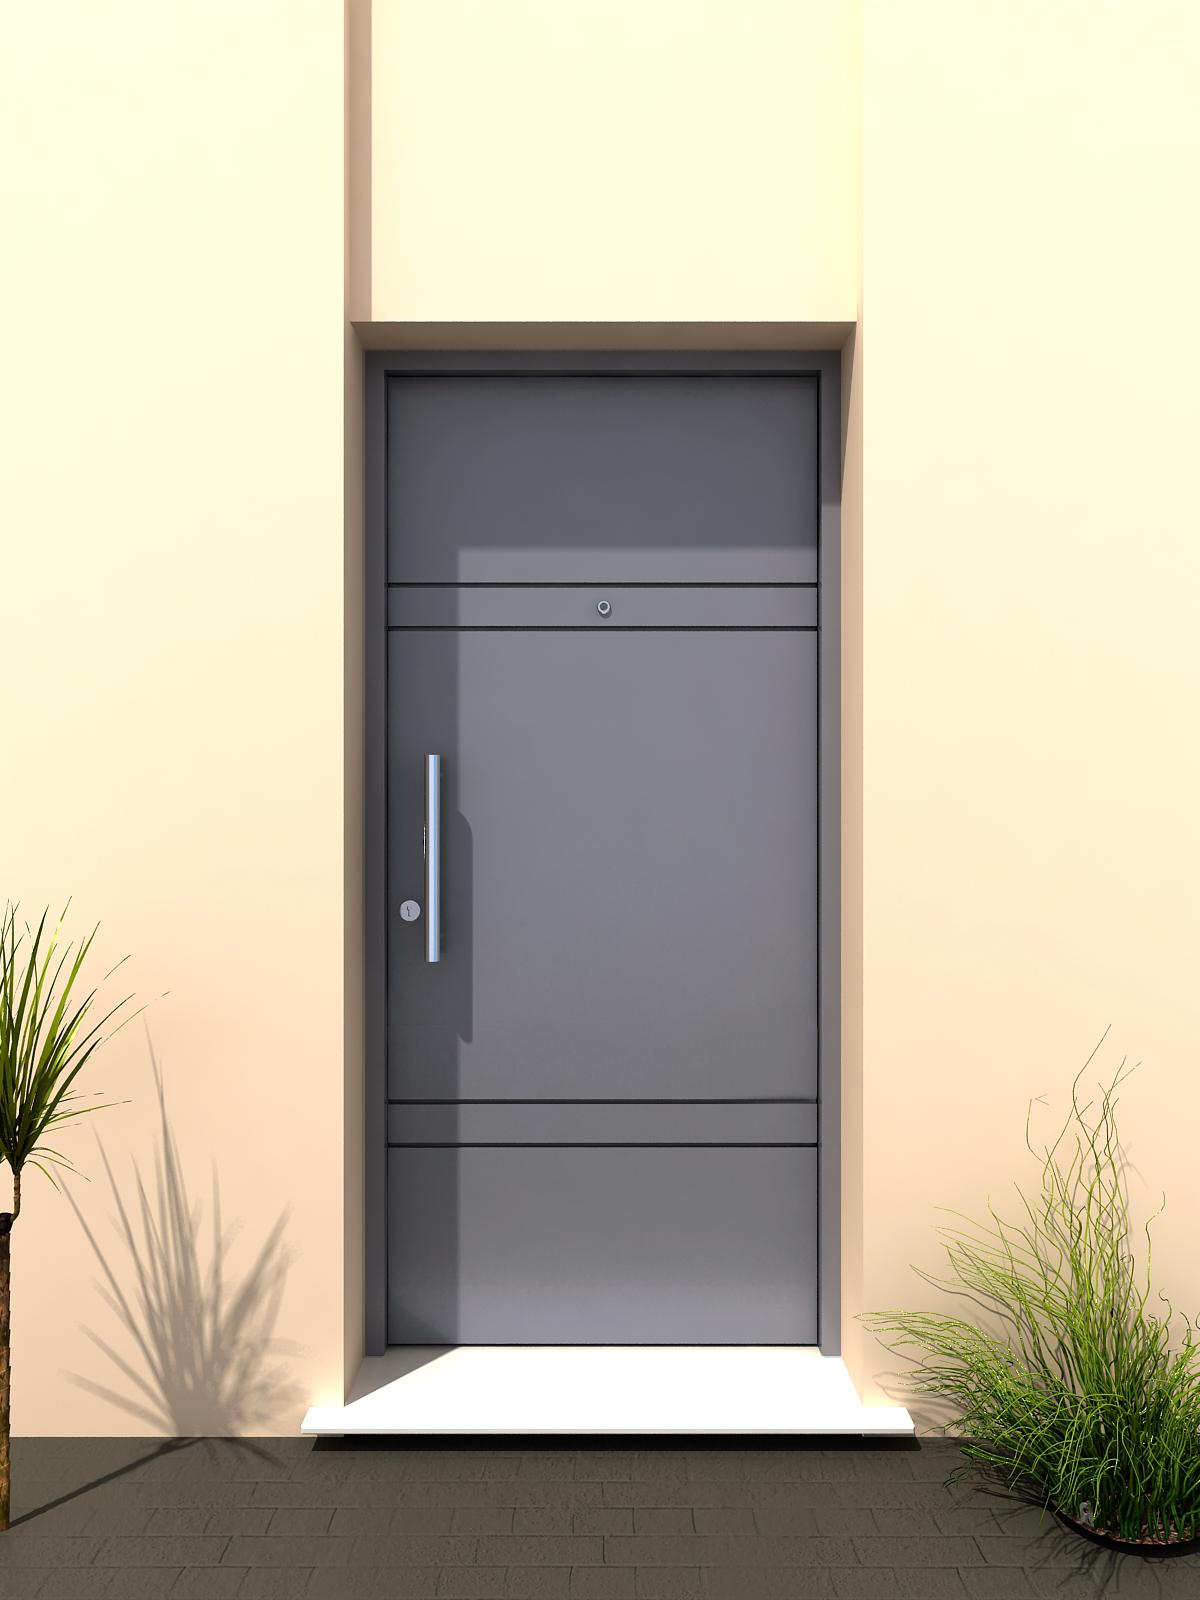 Aberturas mitre puertas de exterior chapa metalicas for Puertas exterior metalicas baratas